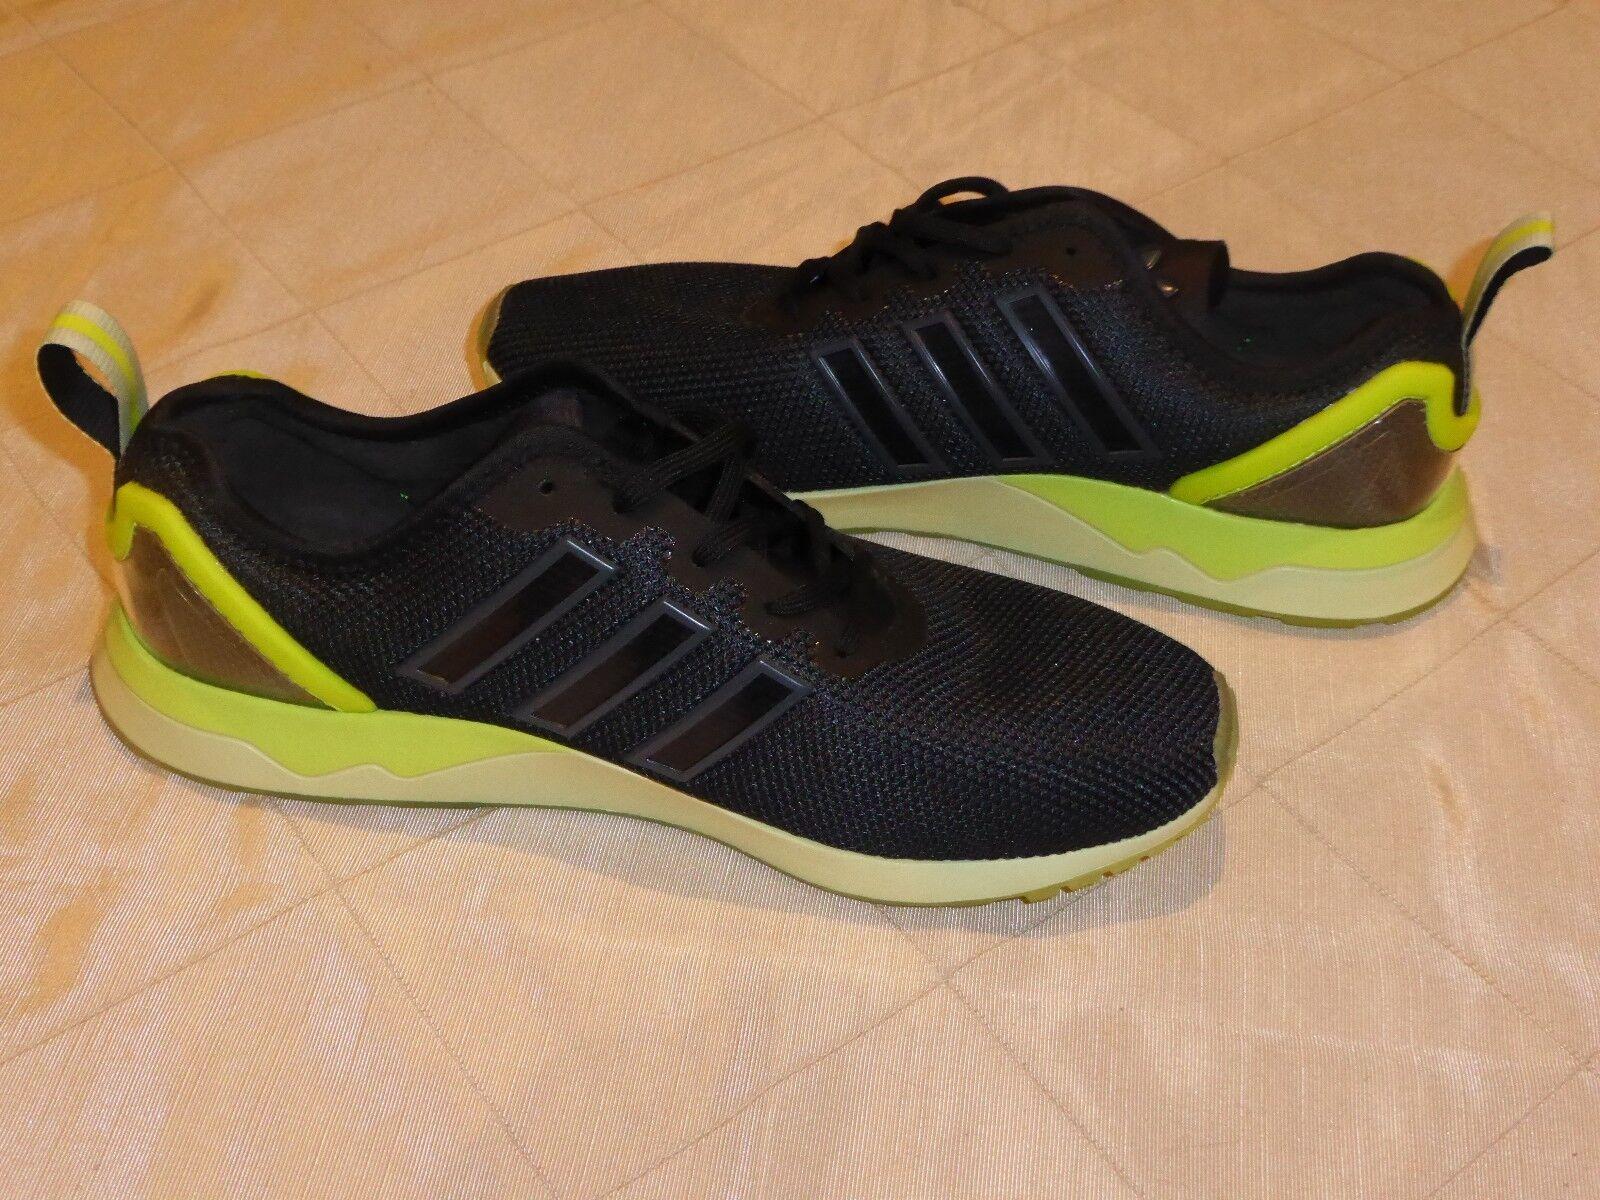 Adidas ZX Flux ADV 'Core Black / Halo' (Size US9) max New max US9) ultra trainer men air 776525